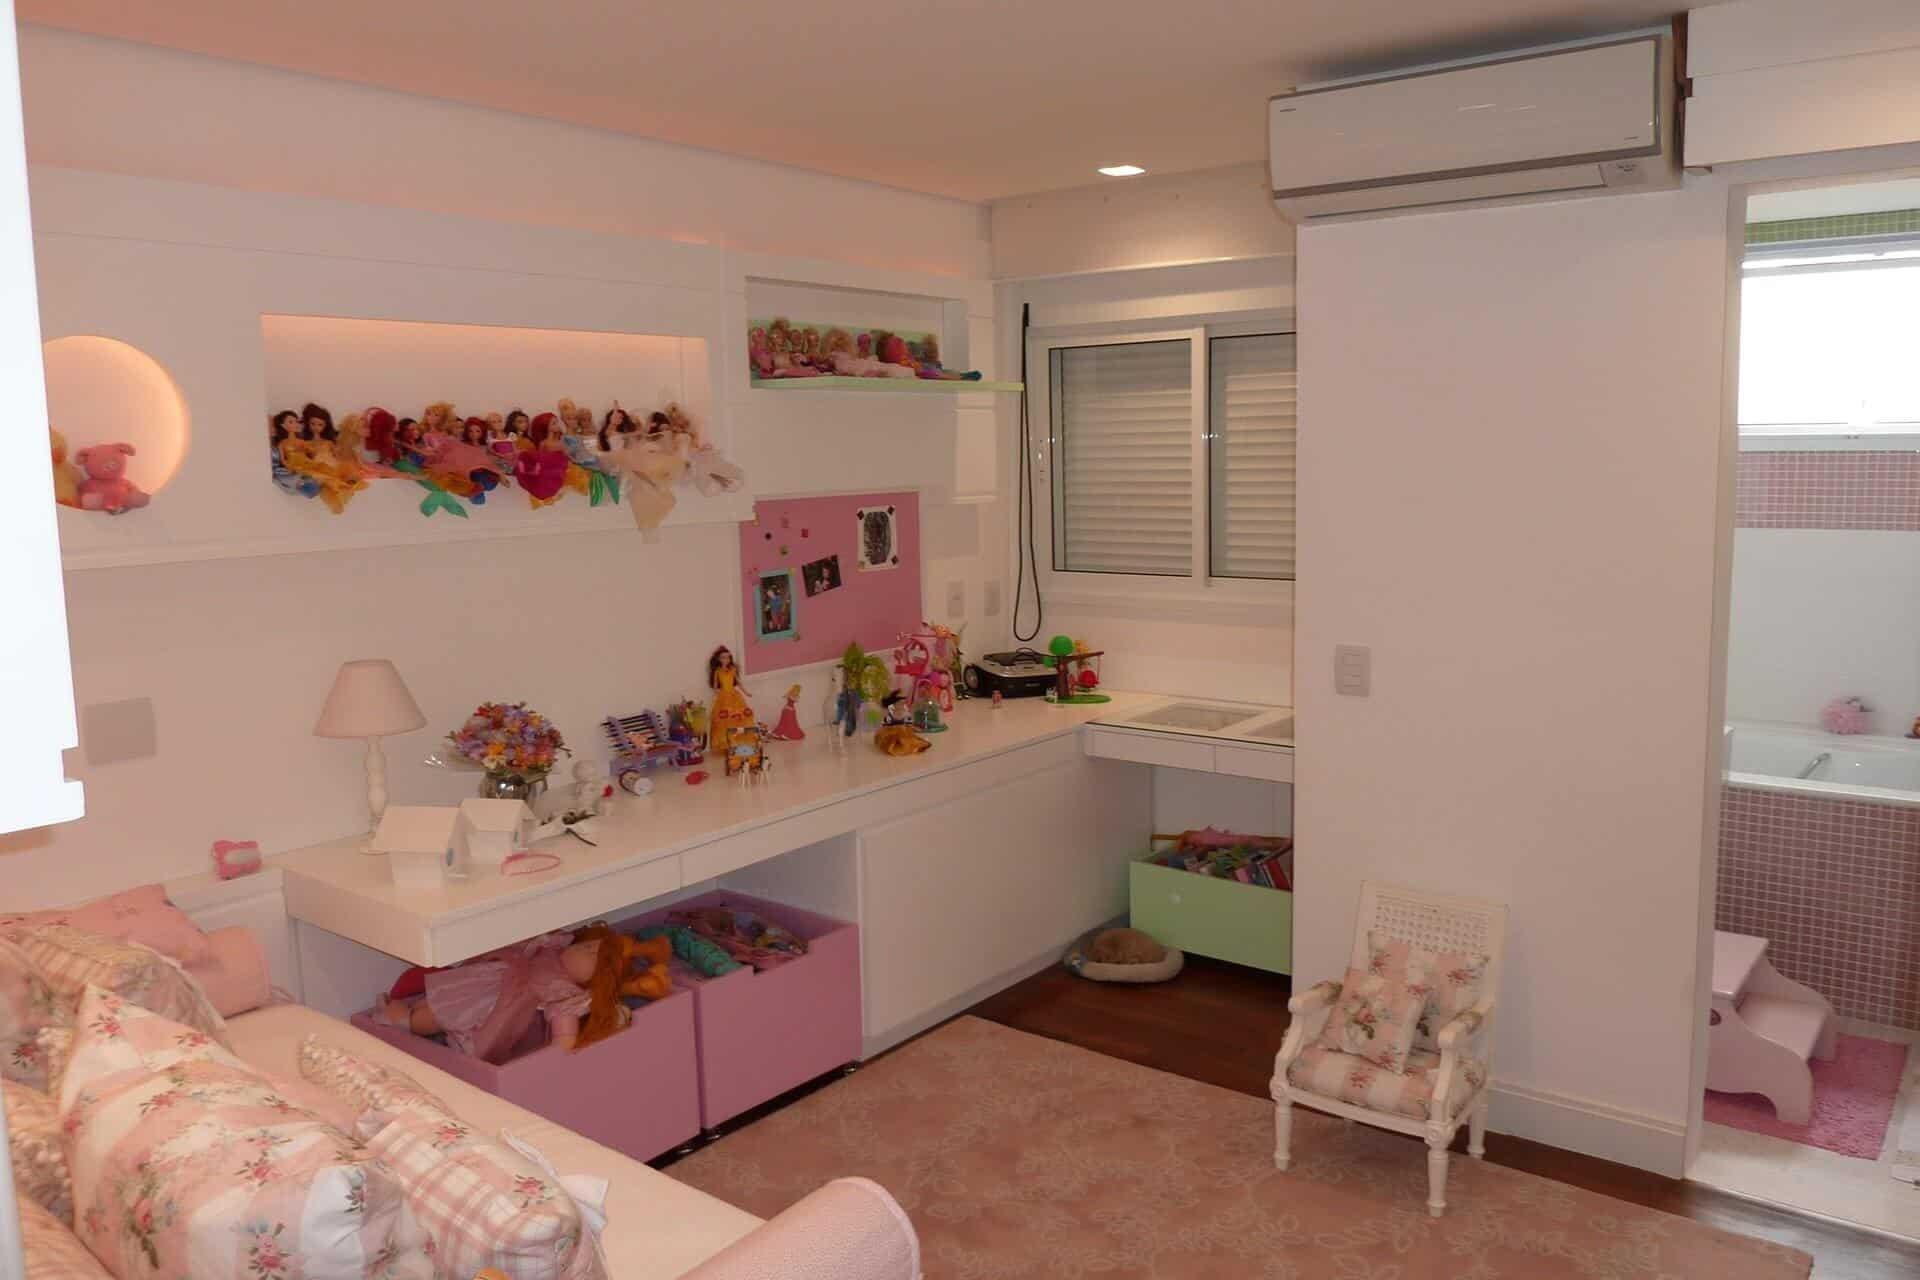 dormitorio-planejado_moveis-sob-medida-galeria-158